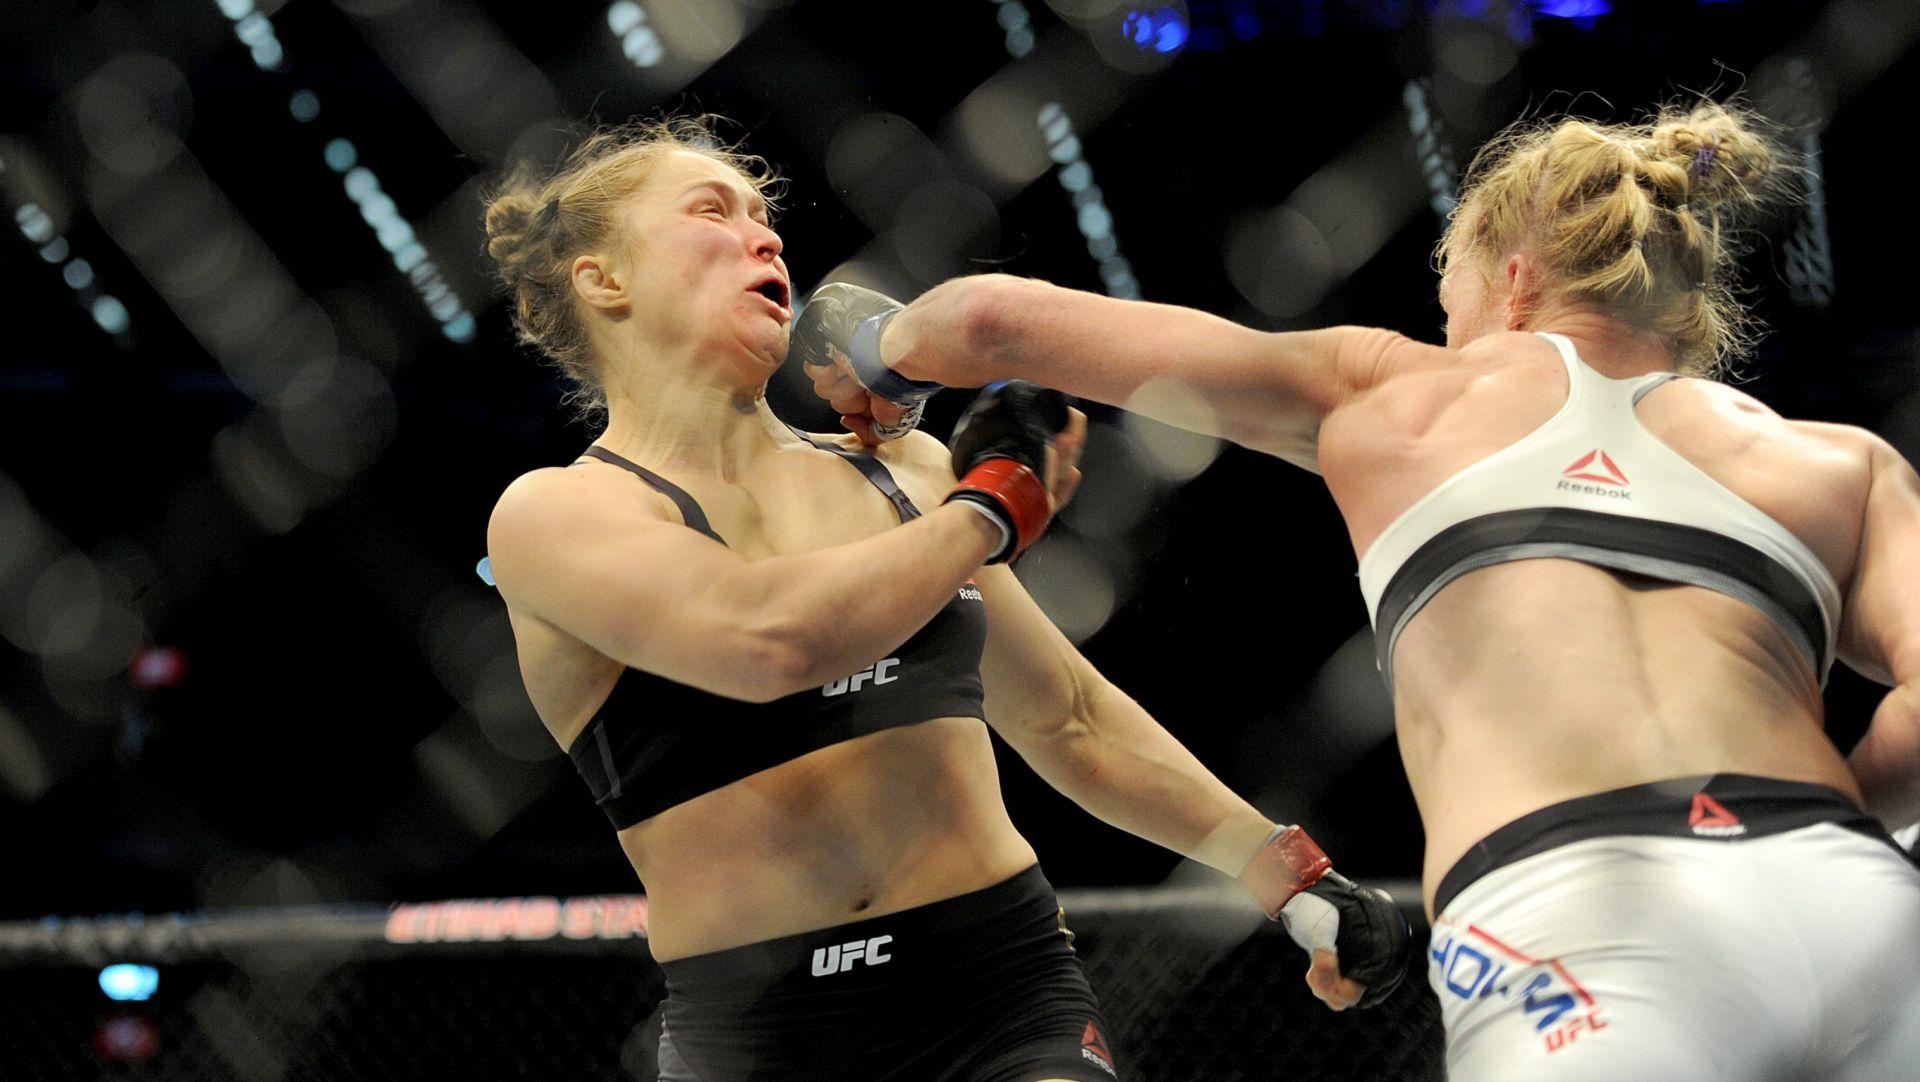 VIDEO: HOLM NOVA PRVAKINJA Ronda Rousey nokautirana u Australiji